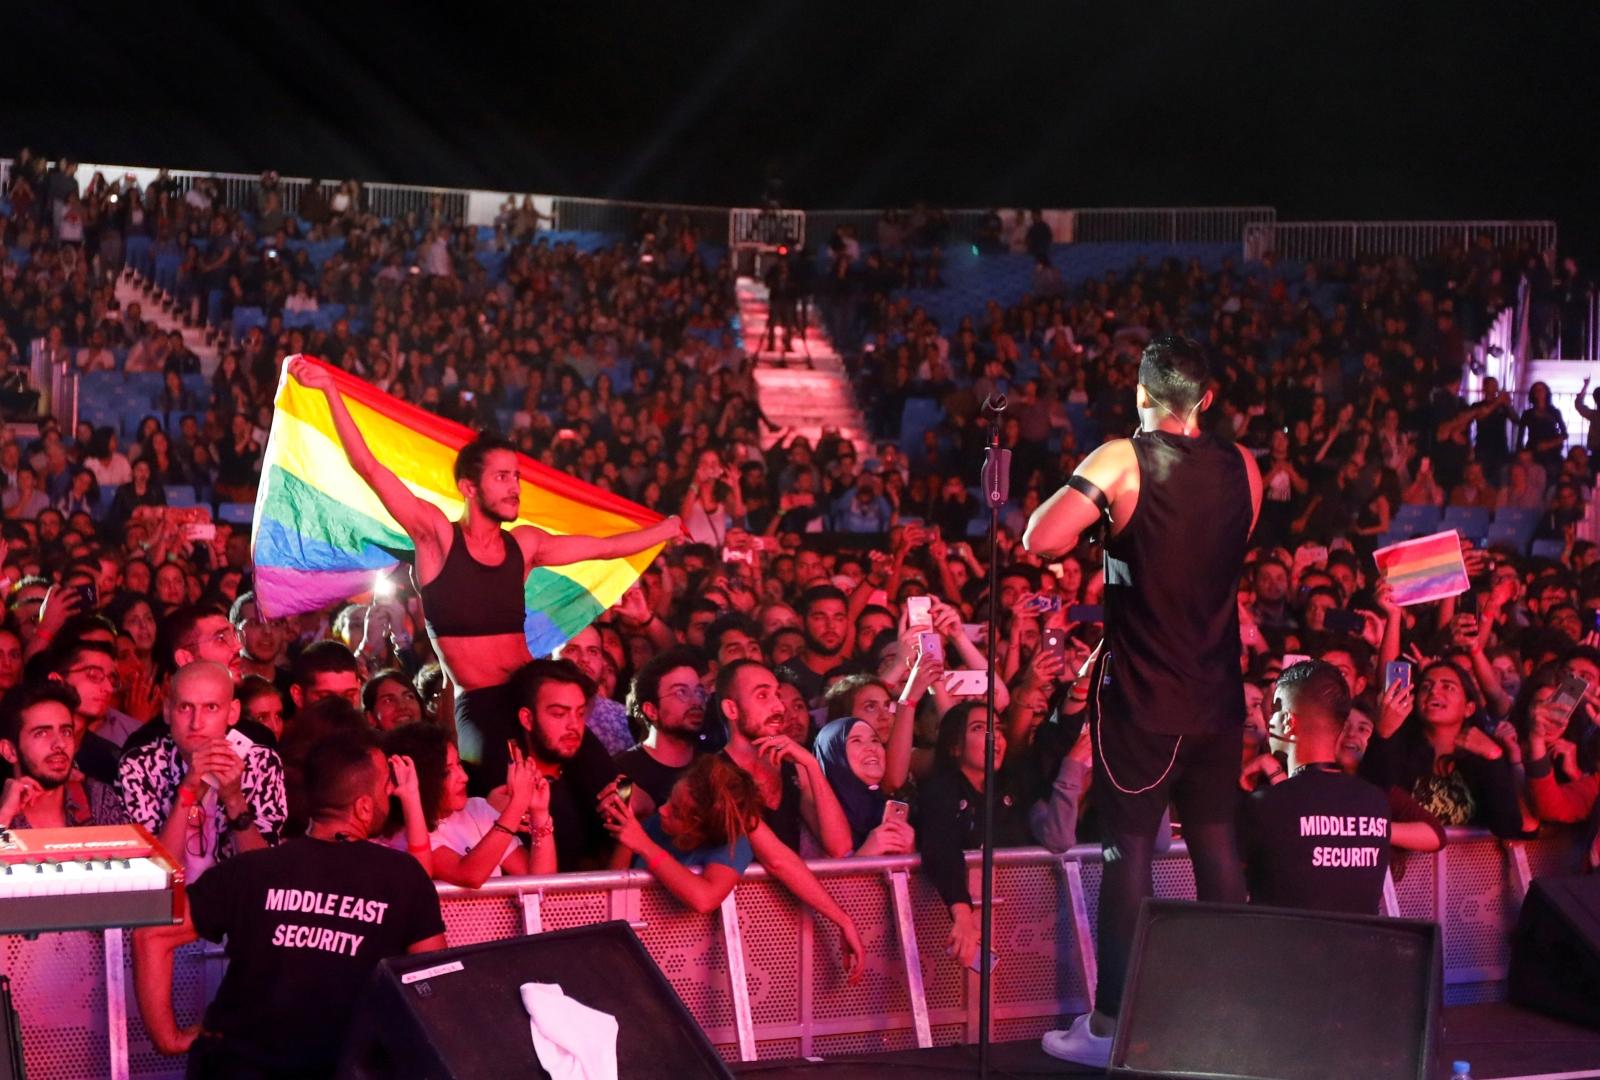 Lebanese Band Mashrou' Leila Take Final Bow At Controversial Cairo Concert